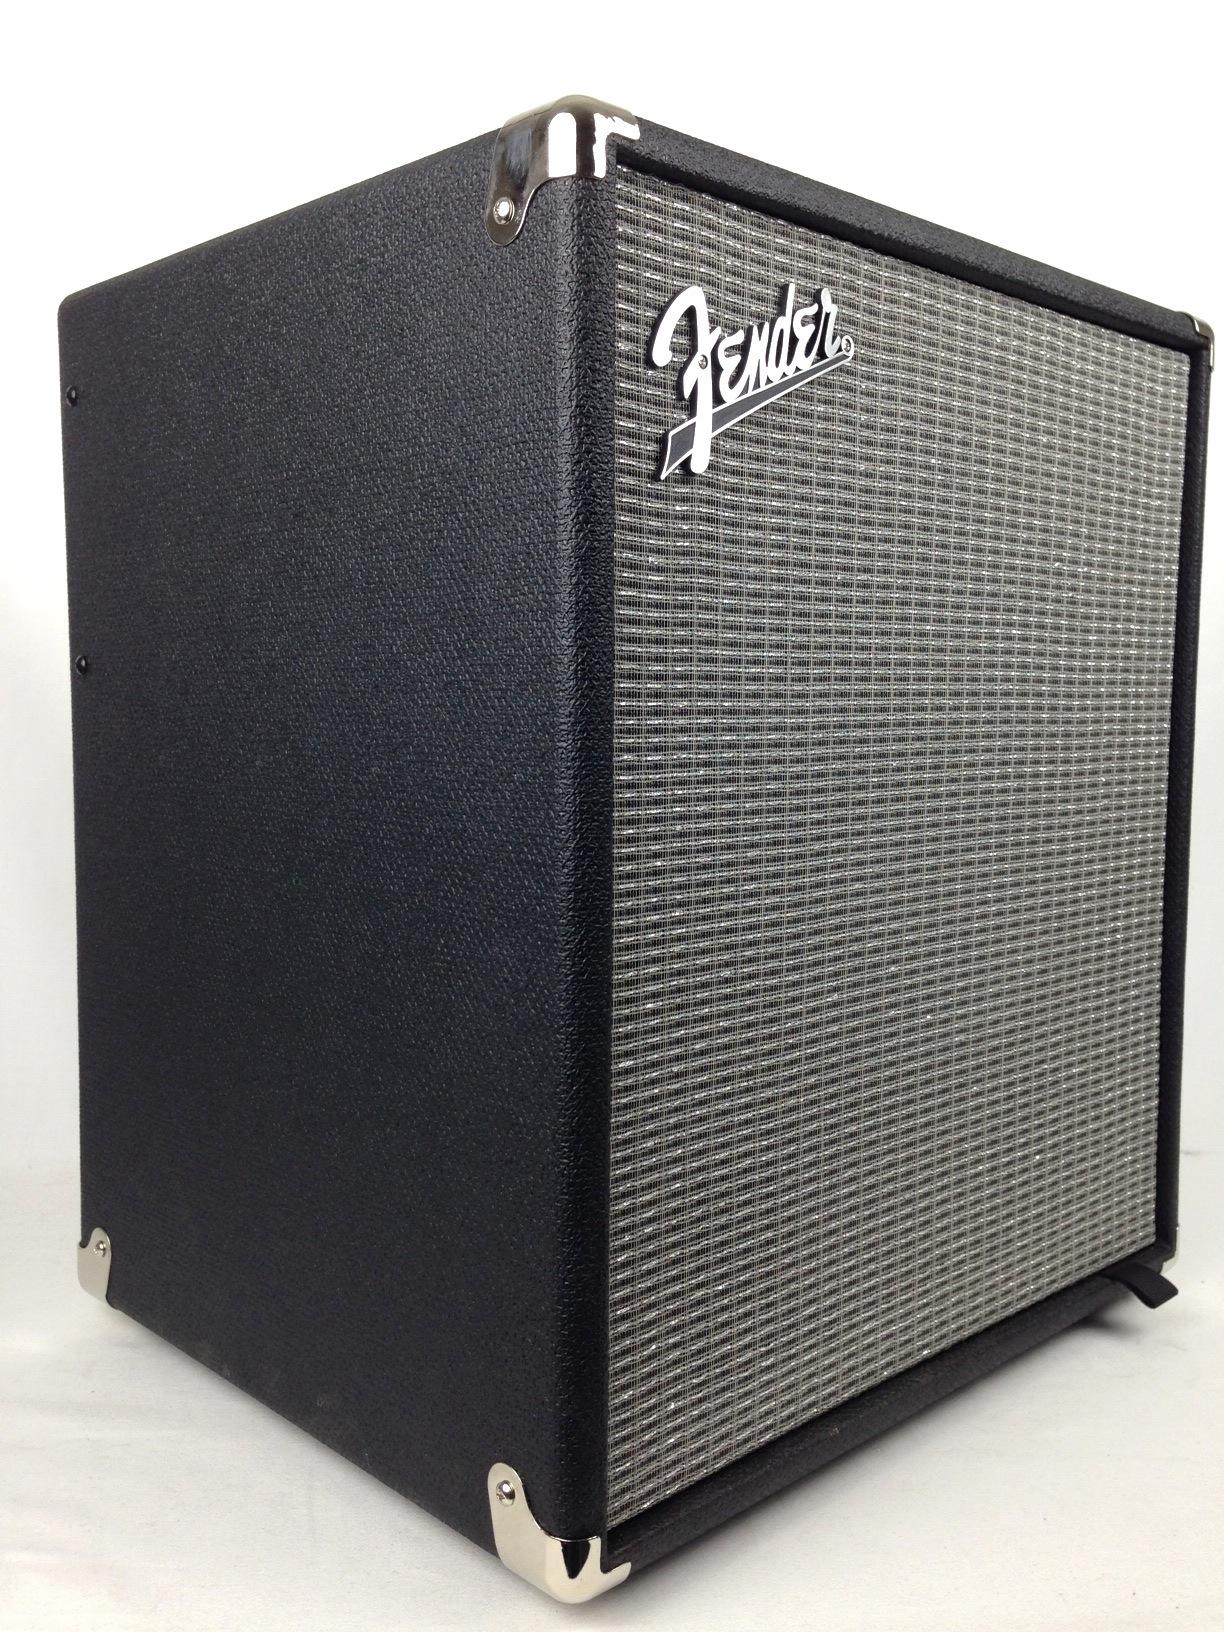 fender rumble 100 combo 100w bass amp. Black Bedroom Furniture Sets. Home Design Ideas